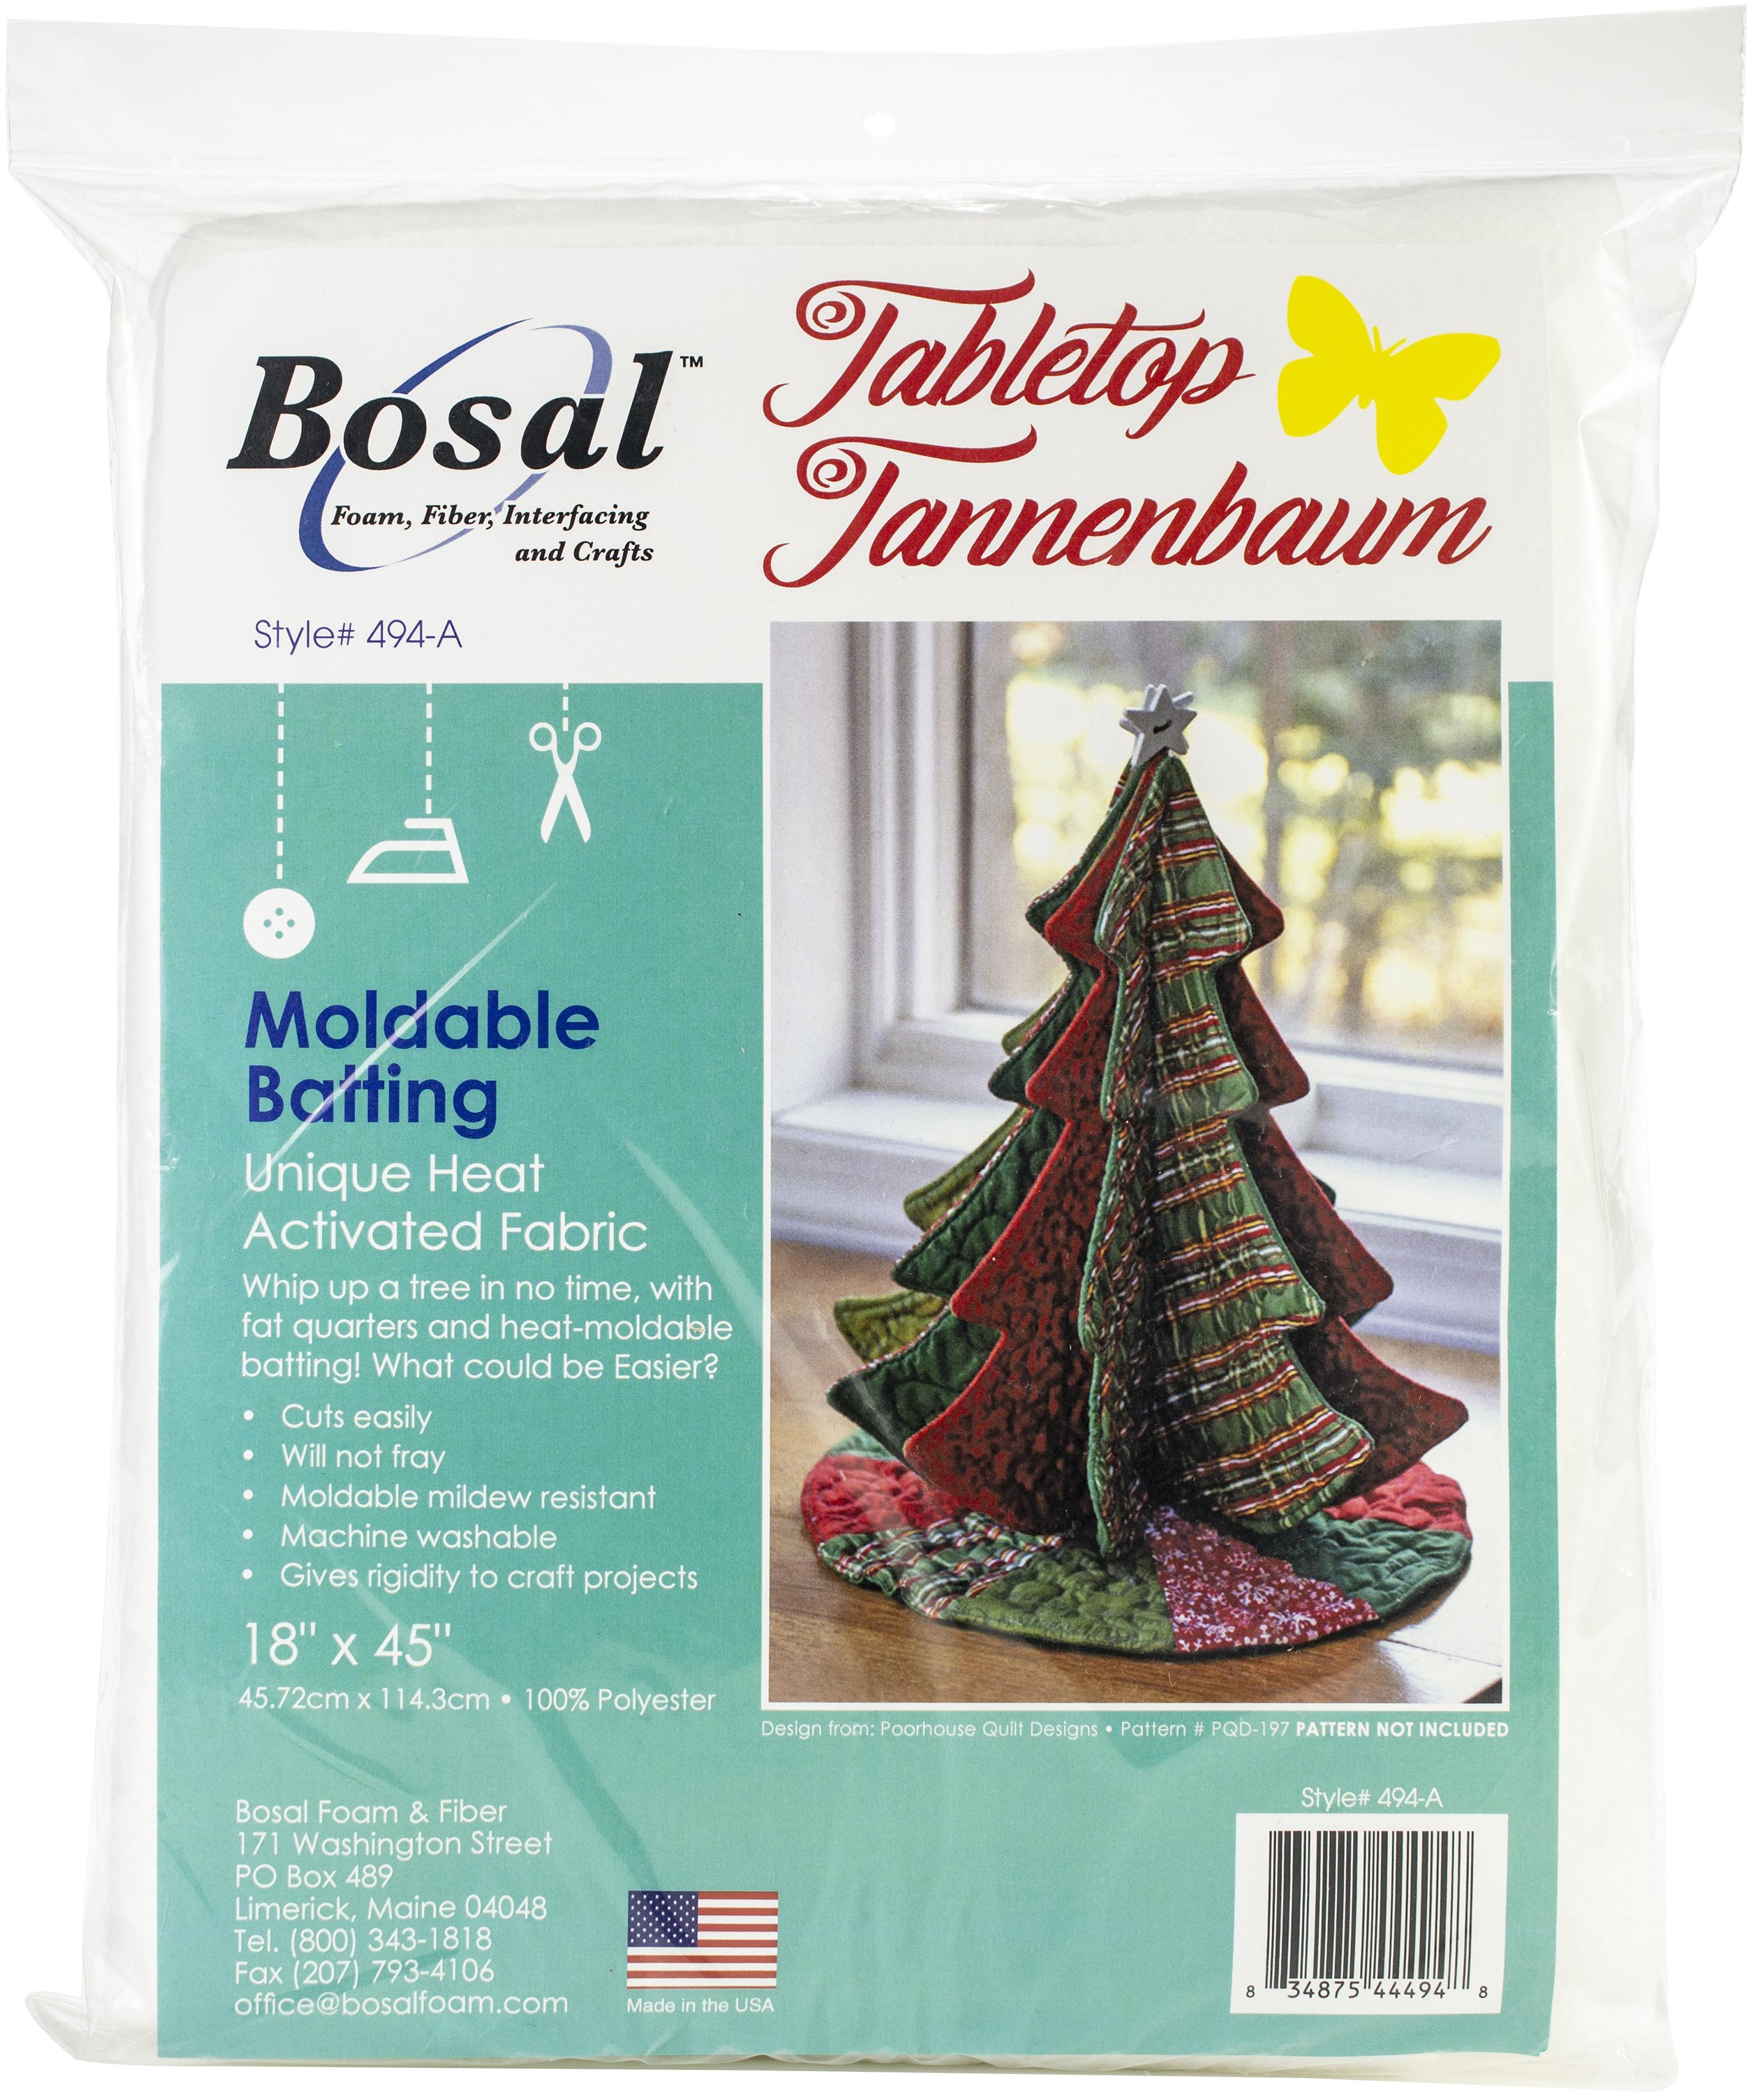 Bosal Moldable Batting 18X45-Tabletop Tannenbaum